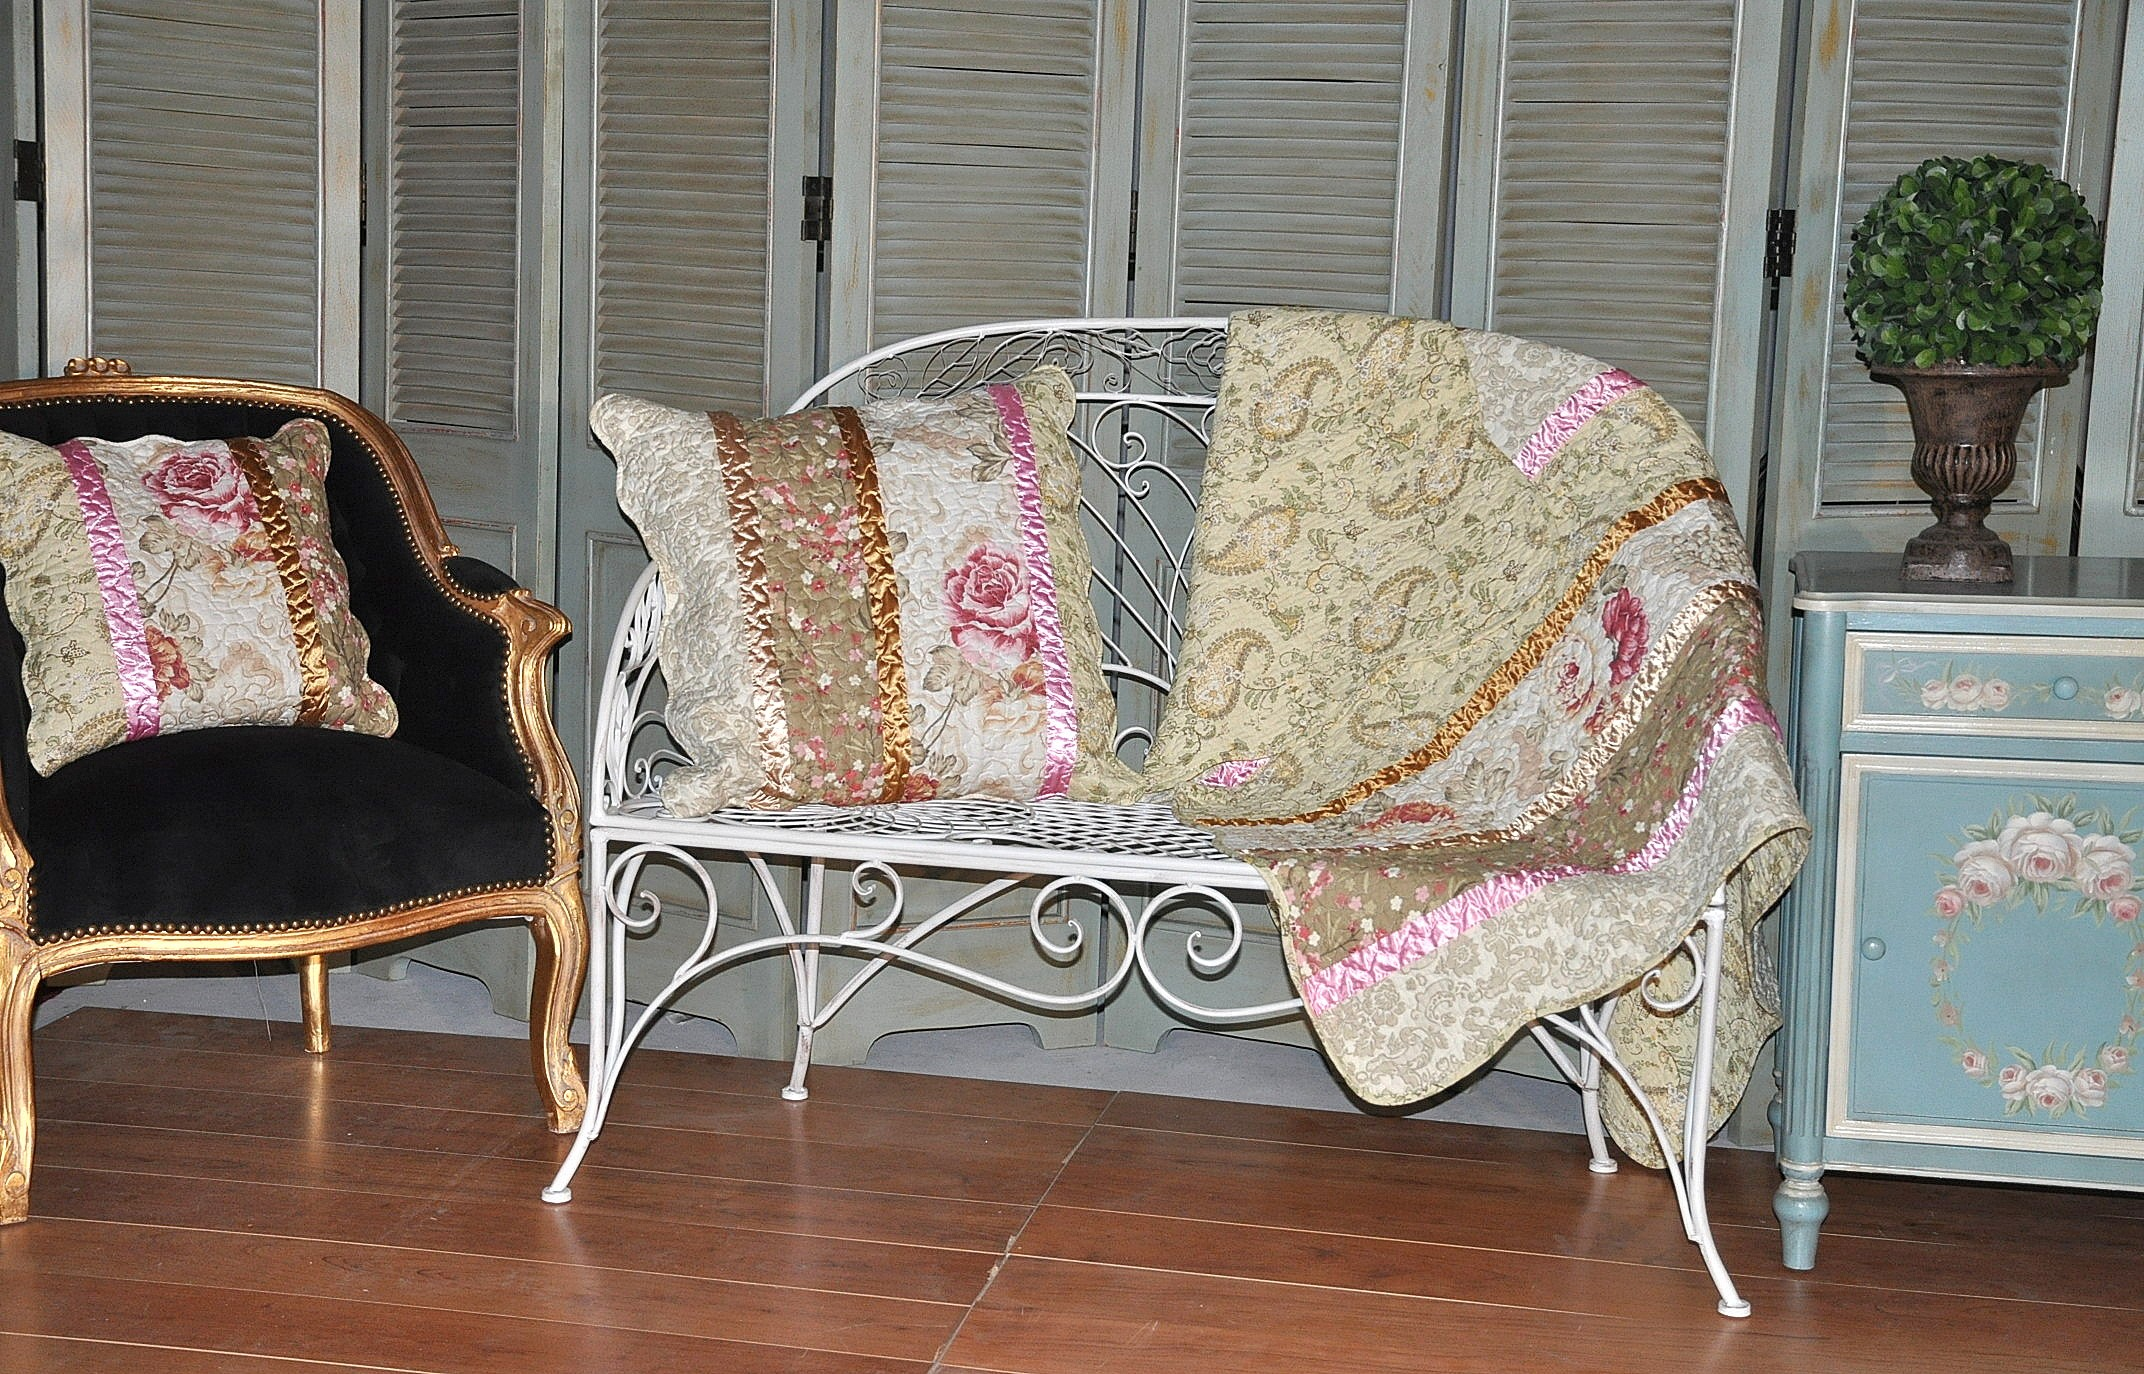 jet de canap imprim fleurs avec ruban demeure et jardin. Black Bedroom Furniture Sets. Home Design Ideas